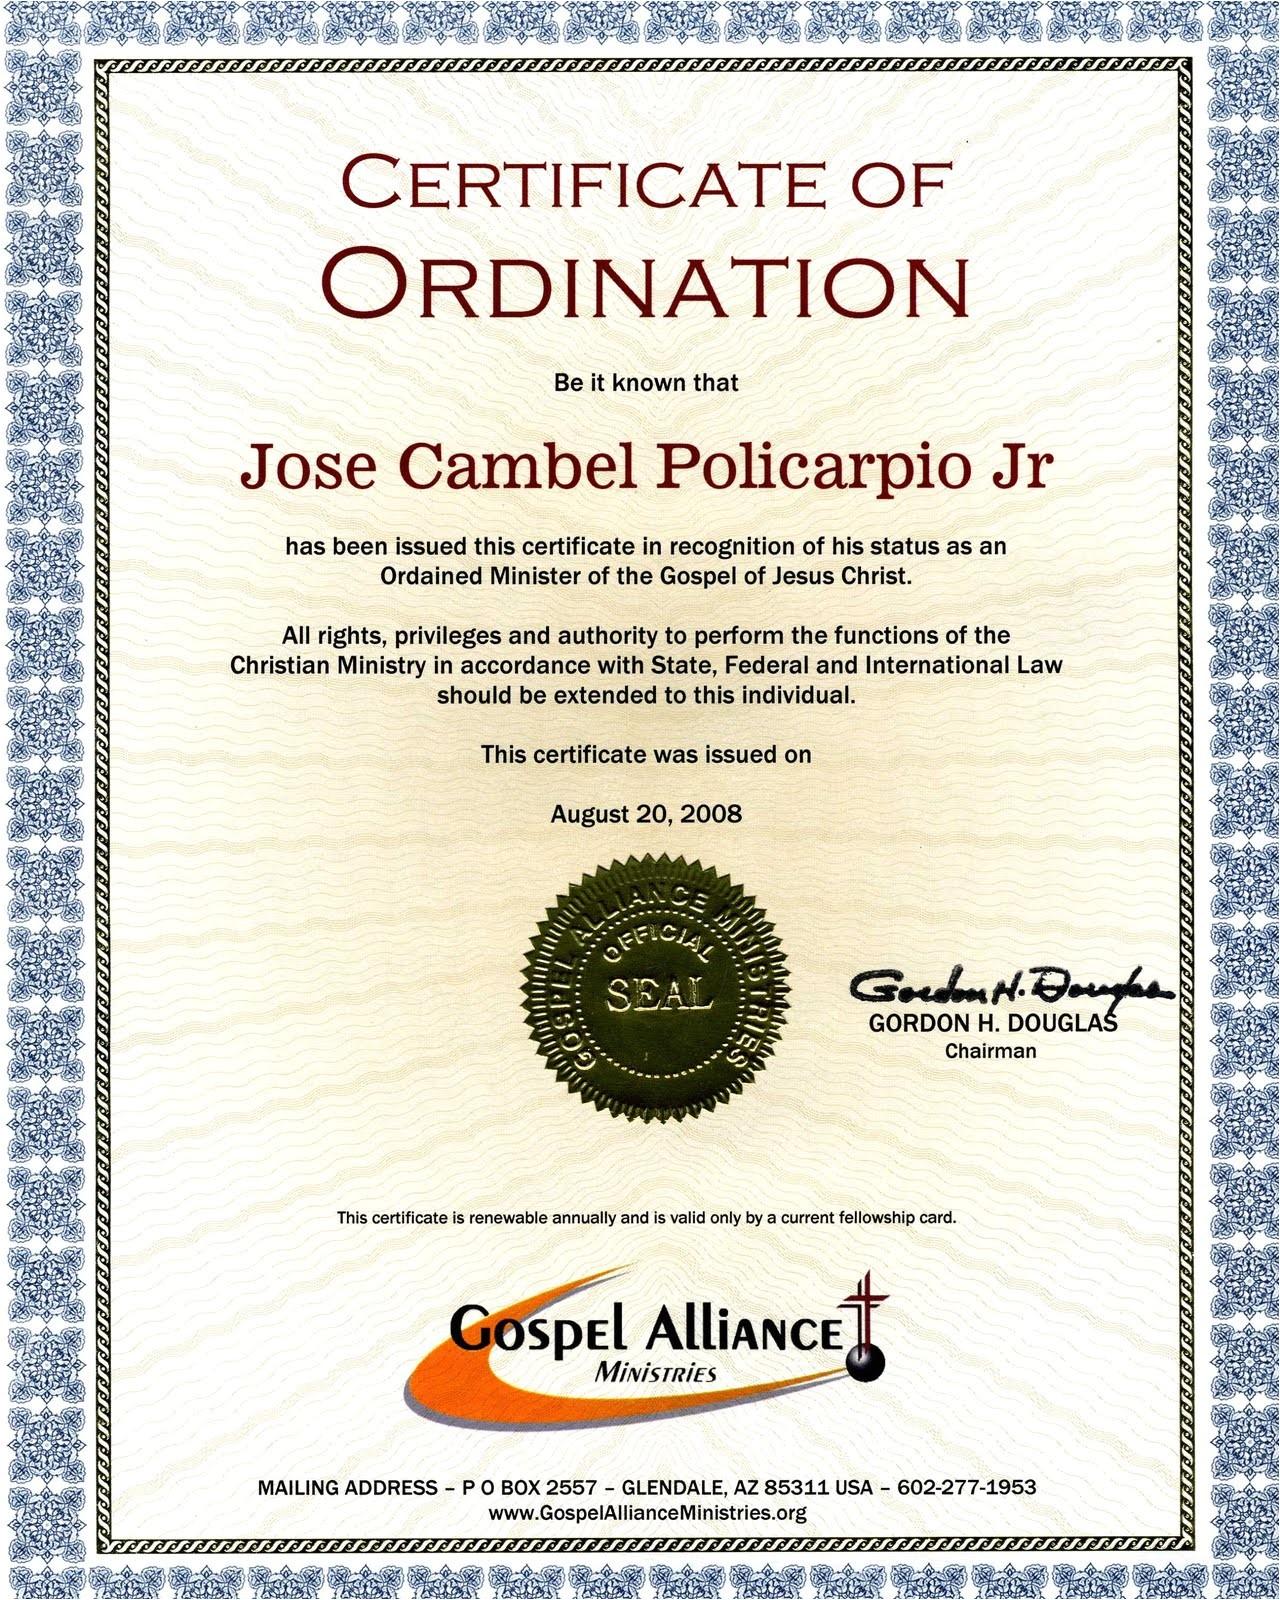 Ordination Certificate Templates Pin ordination Certificate Templates Pictures On Pinterest